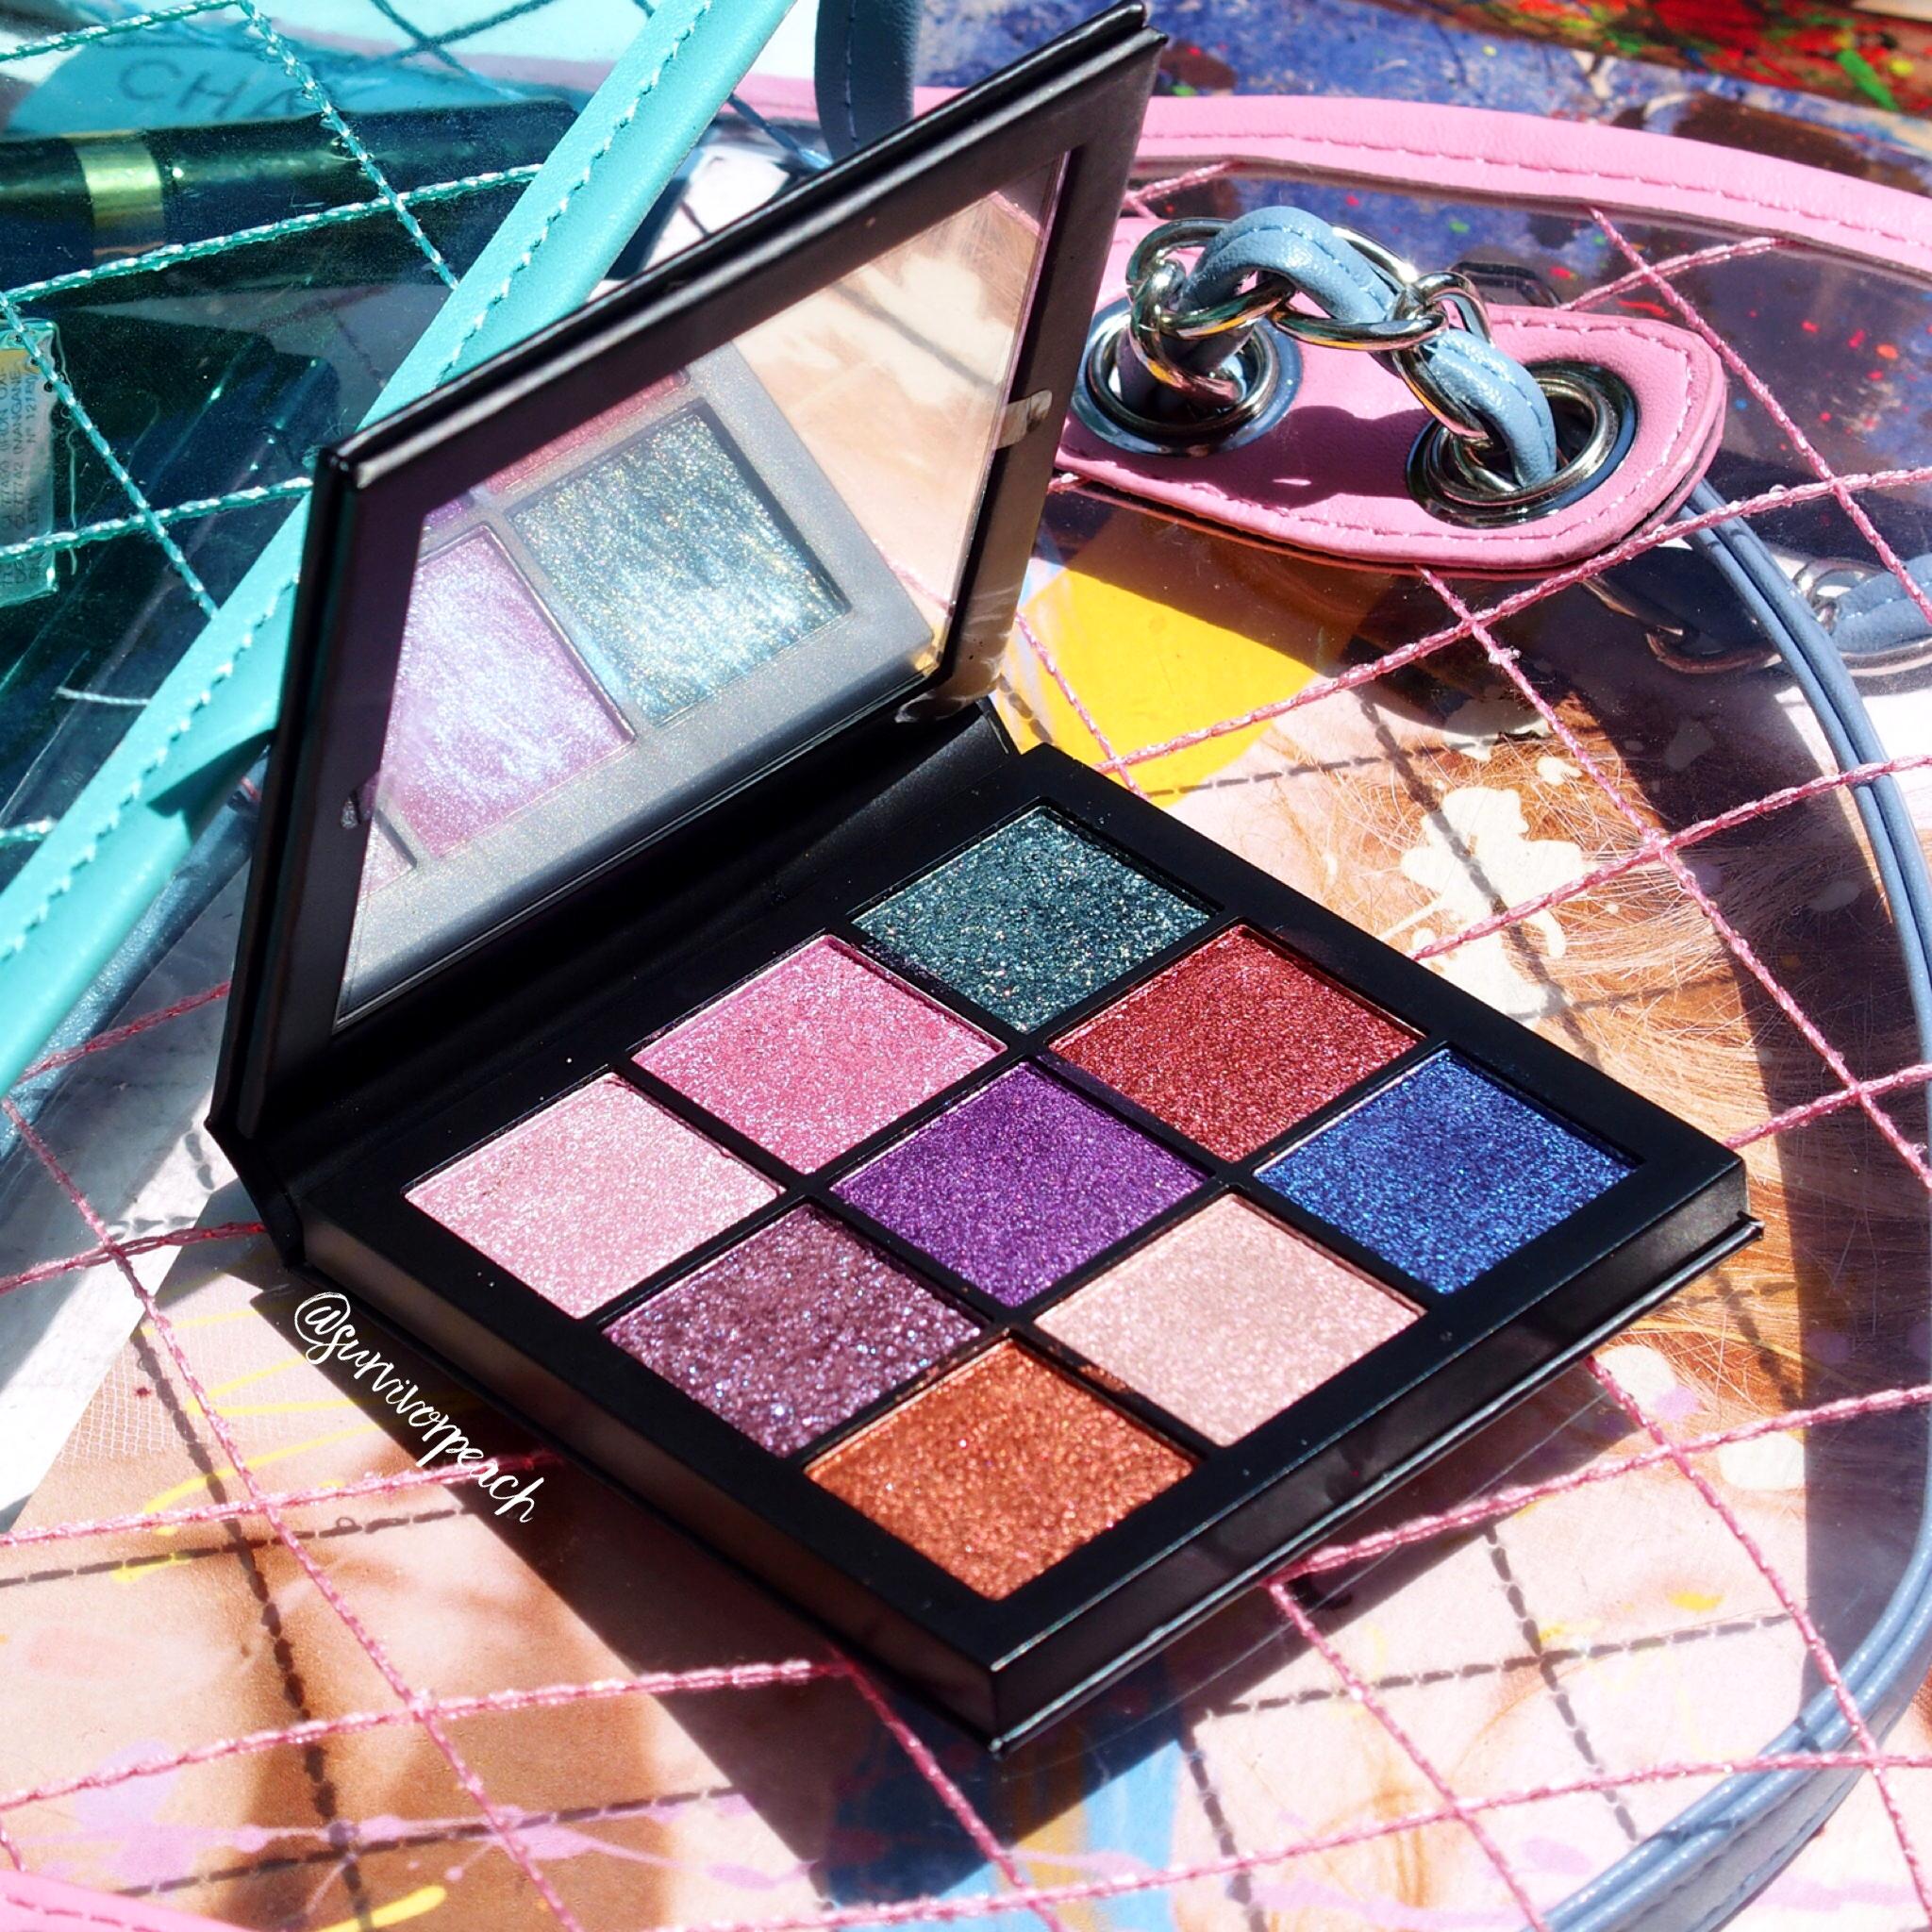 Huda Beauty Gemstone Obsessions palette